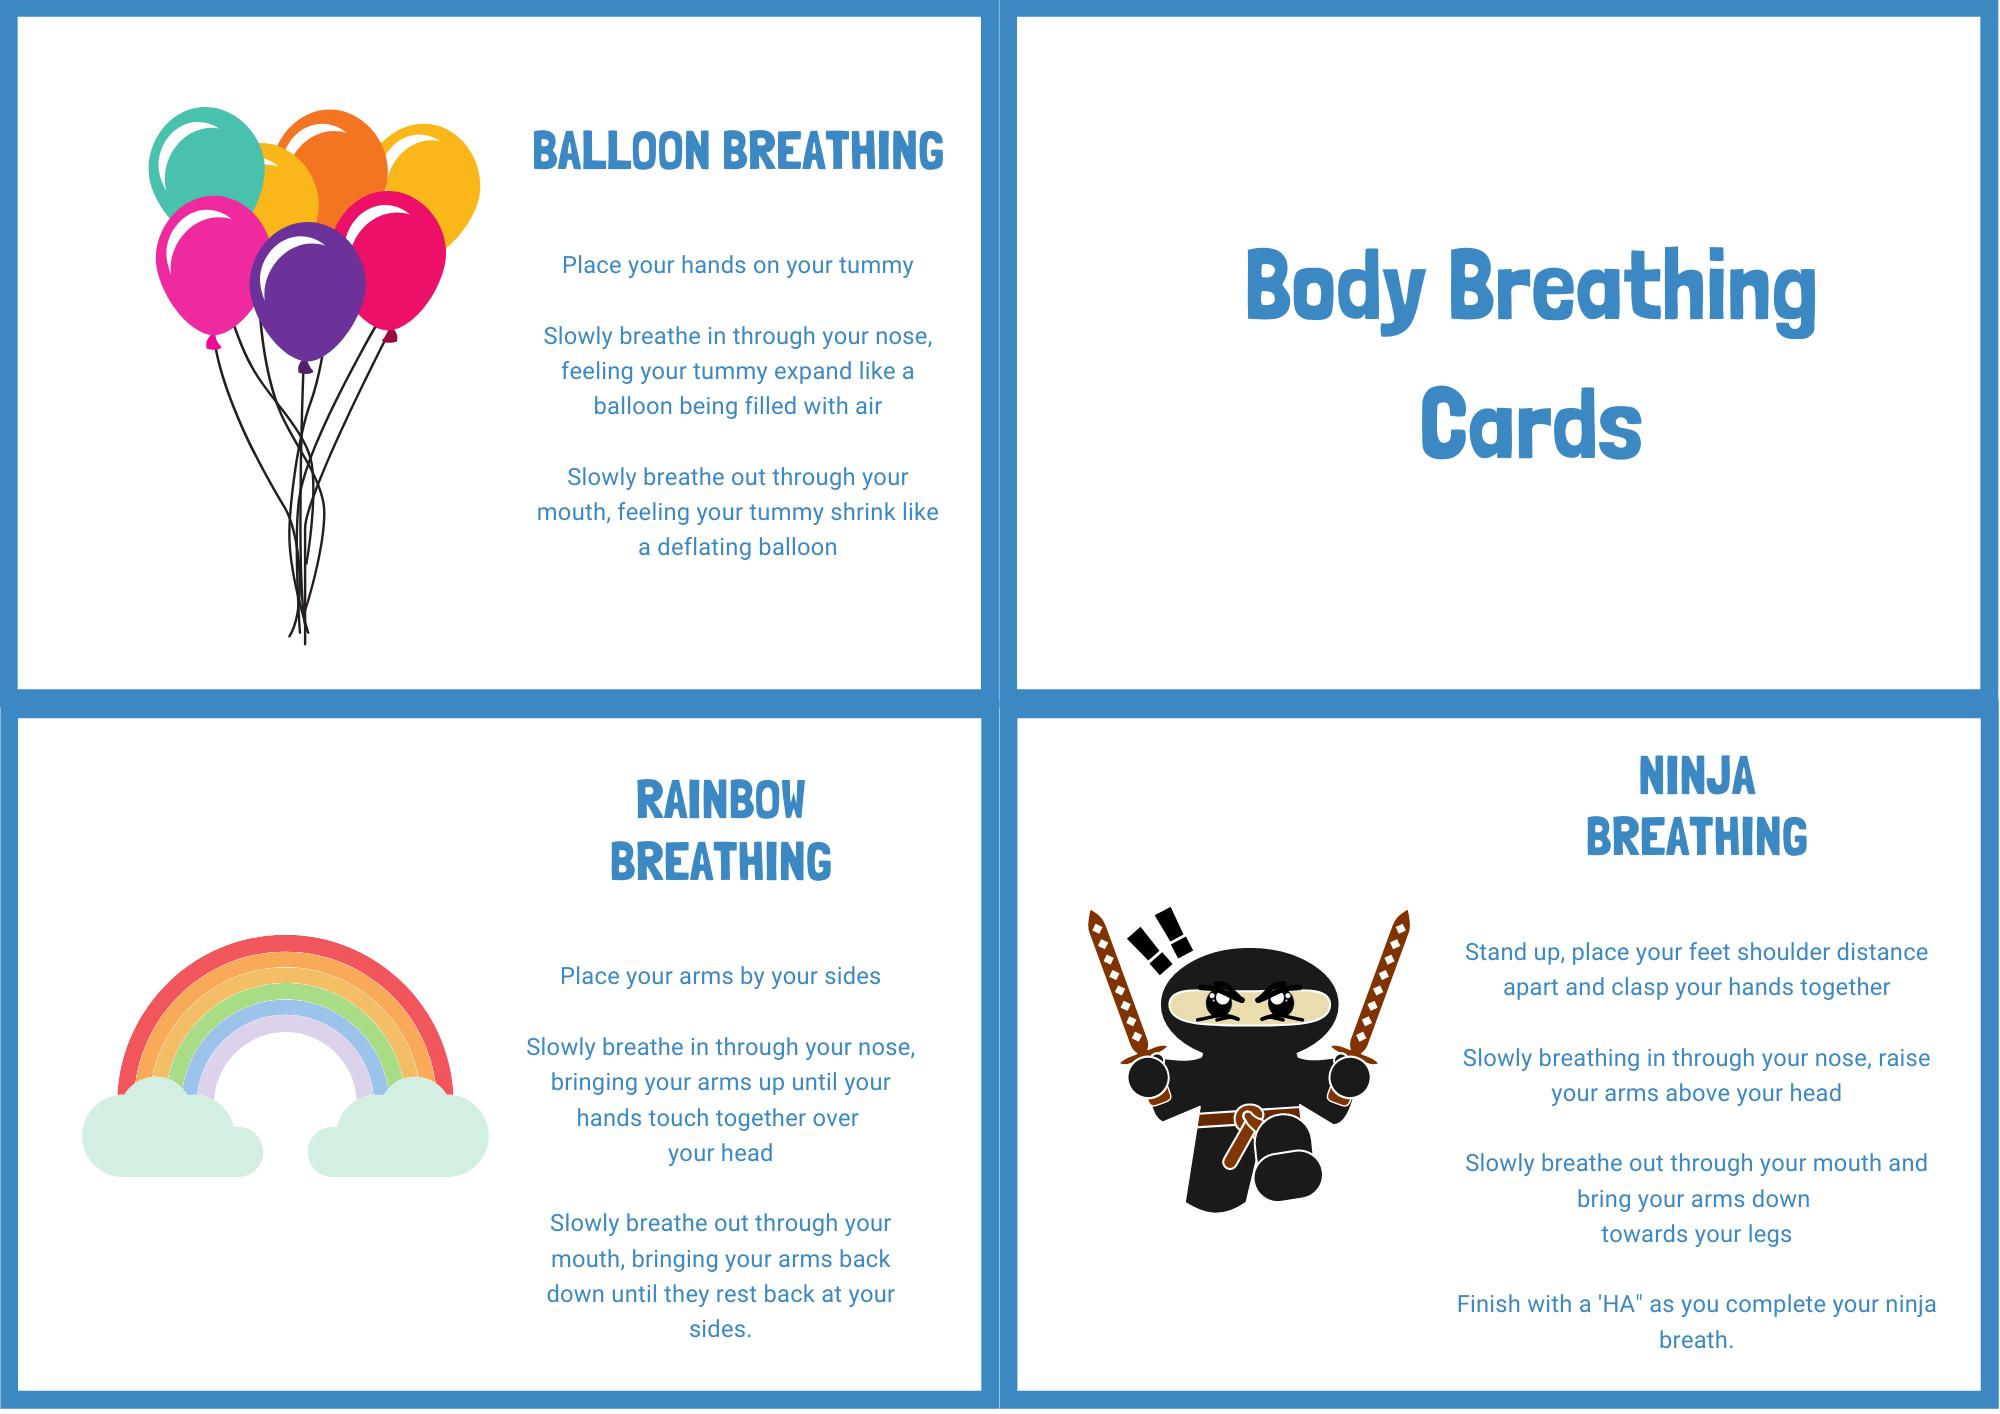 Body Breathing